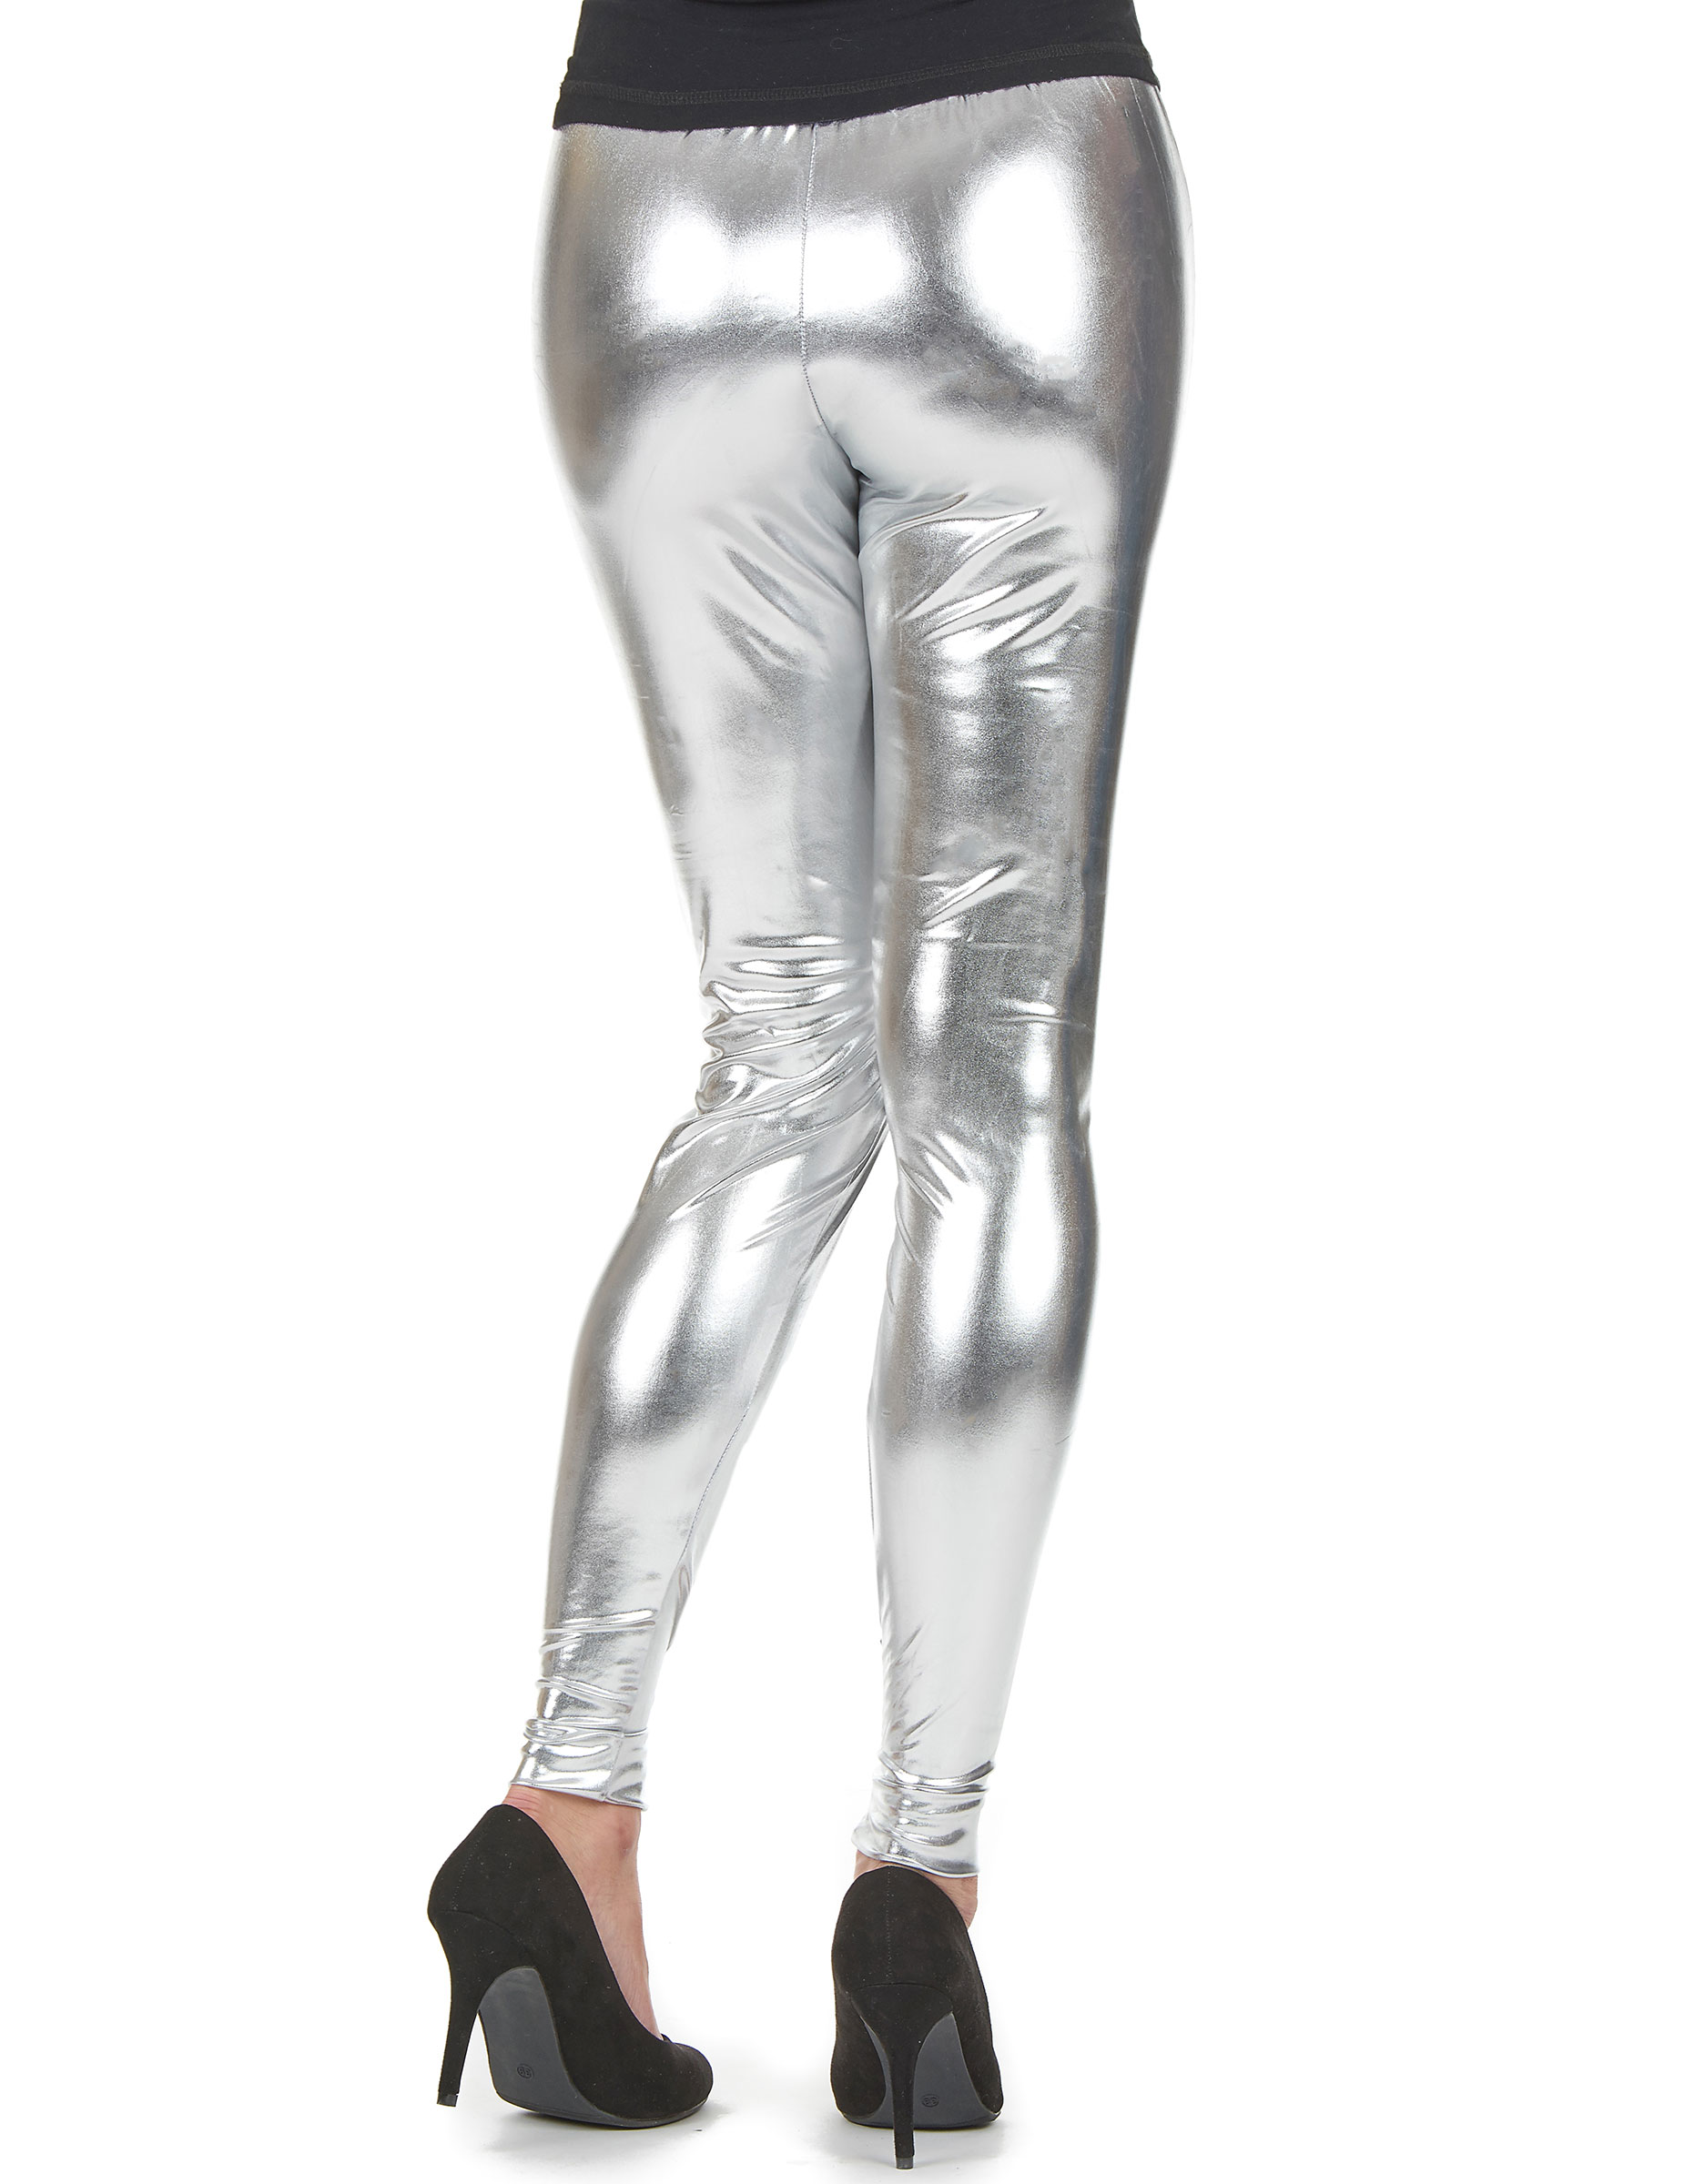 94265c720258c0 Silberne Leggings für Damen